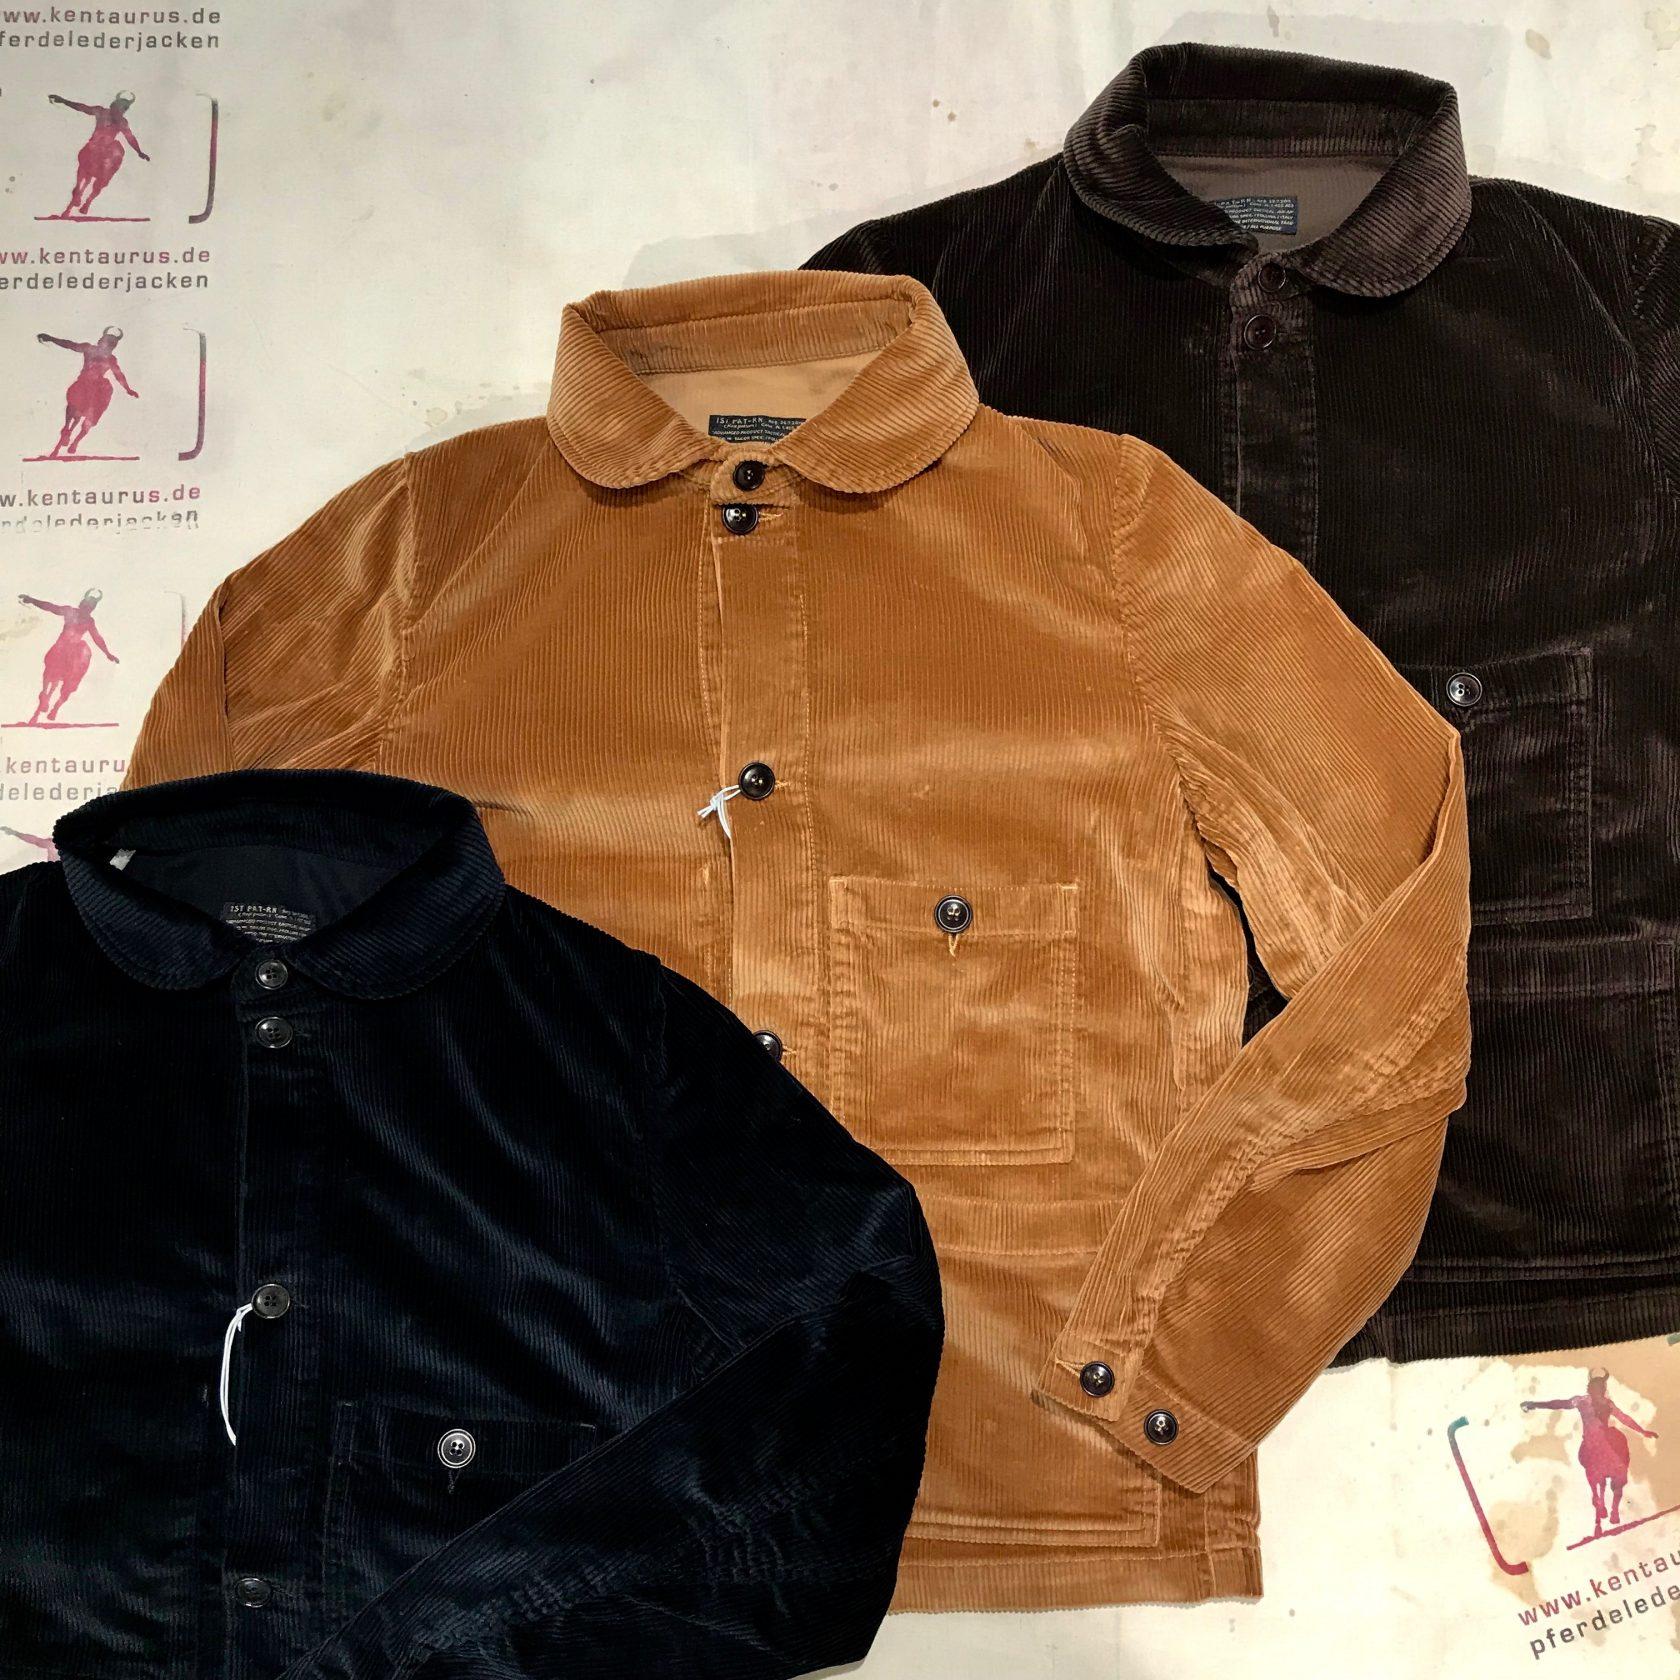 1st-Pat-rn: laboratorio cord jacket